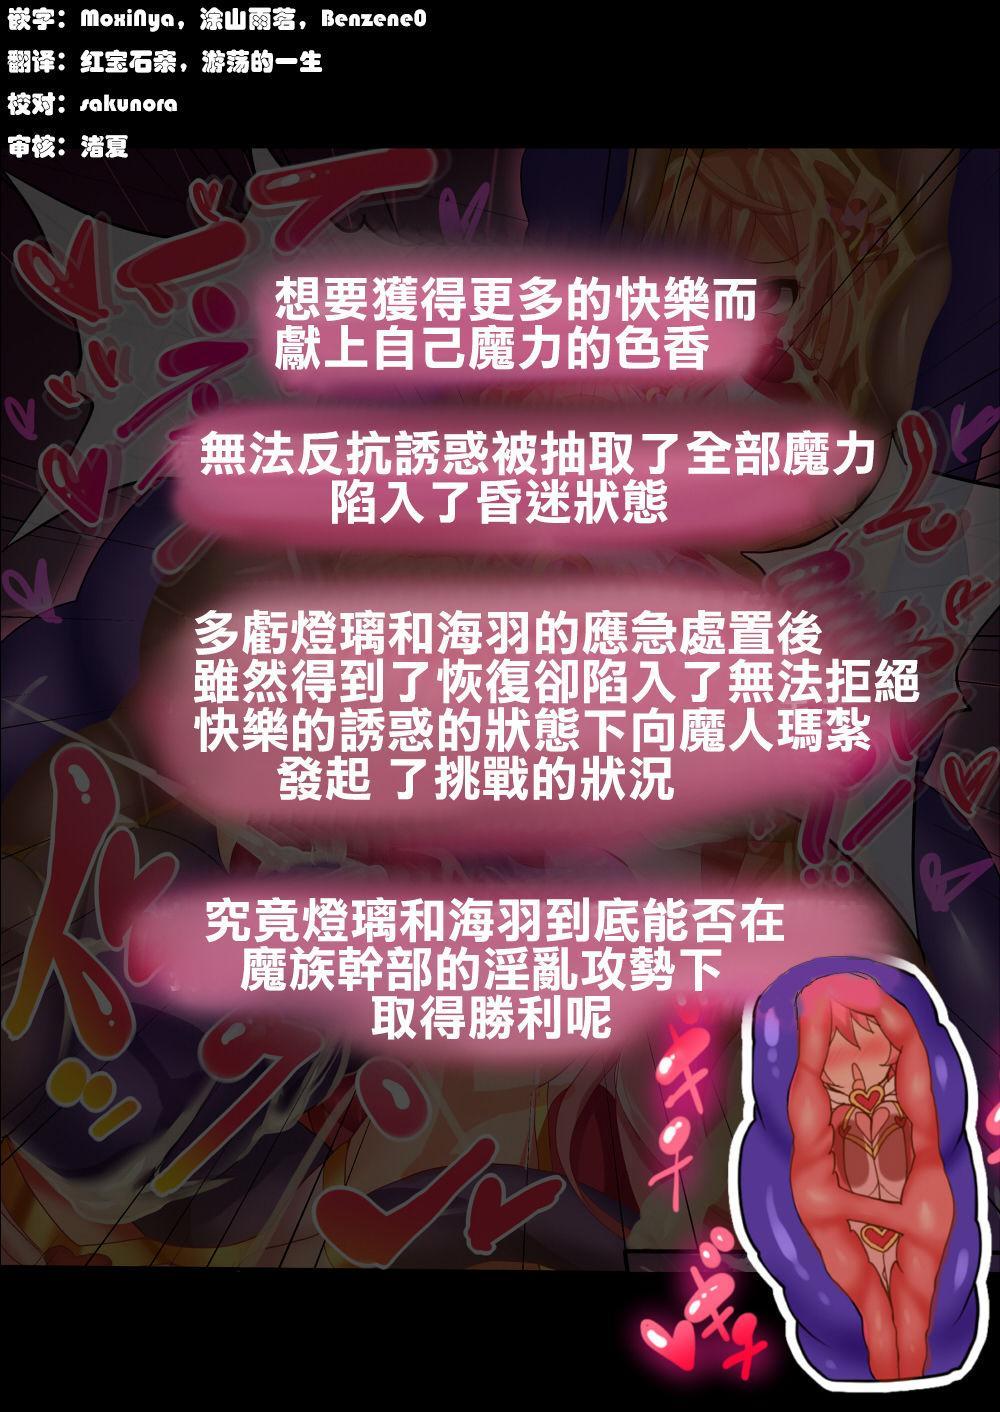 [Makutsutei (Nagai Wataru)] Orgasm Unit EX -Mahou Senshi Akari Ch. 1-5 [Chinese] [这很恶堕 x Lolipoi汉化组] 54